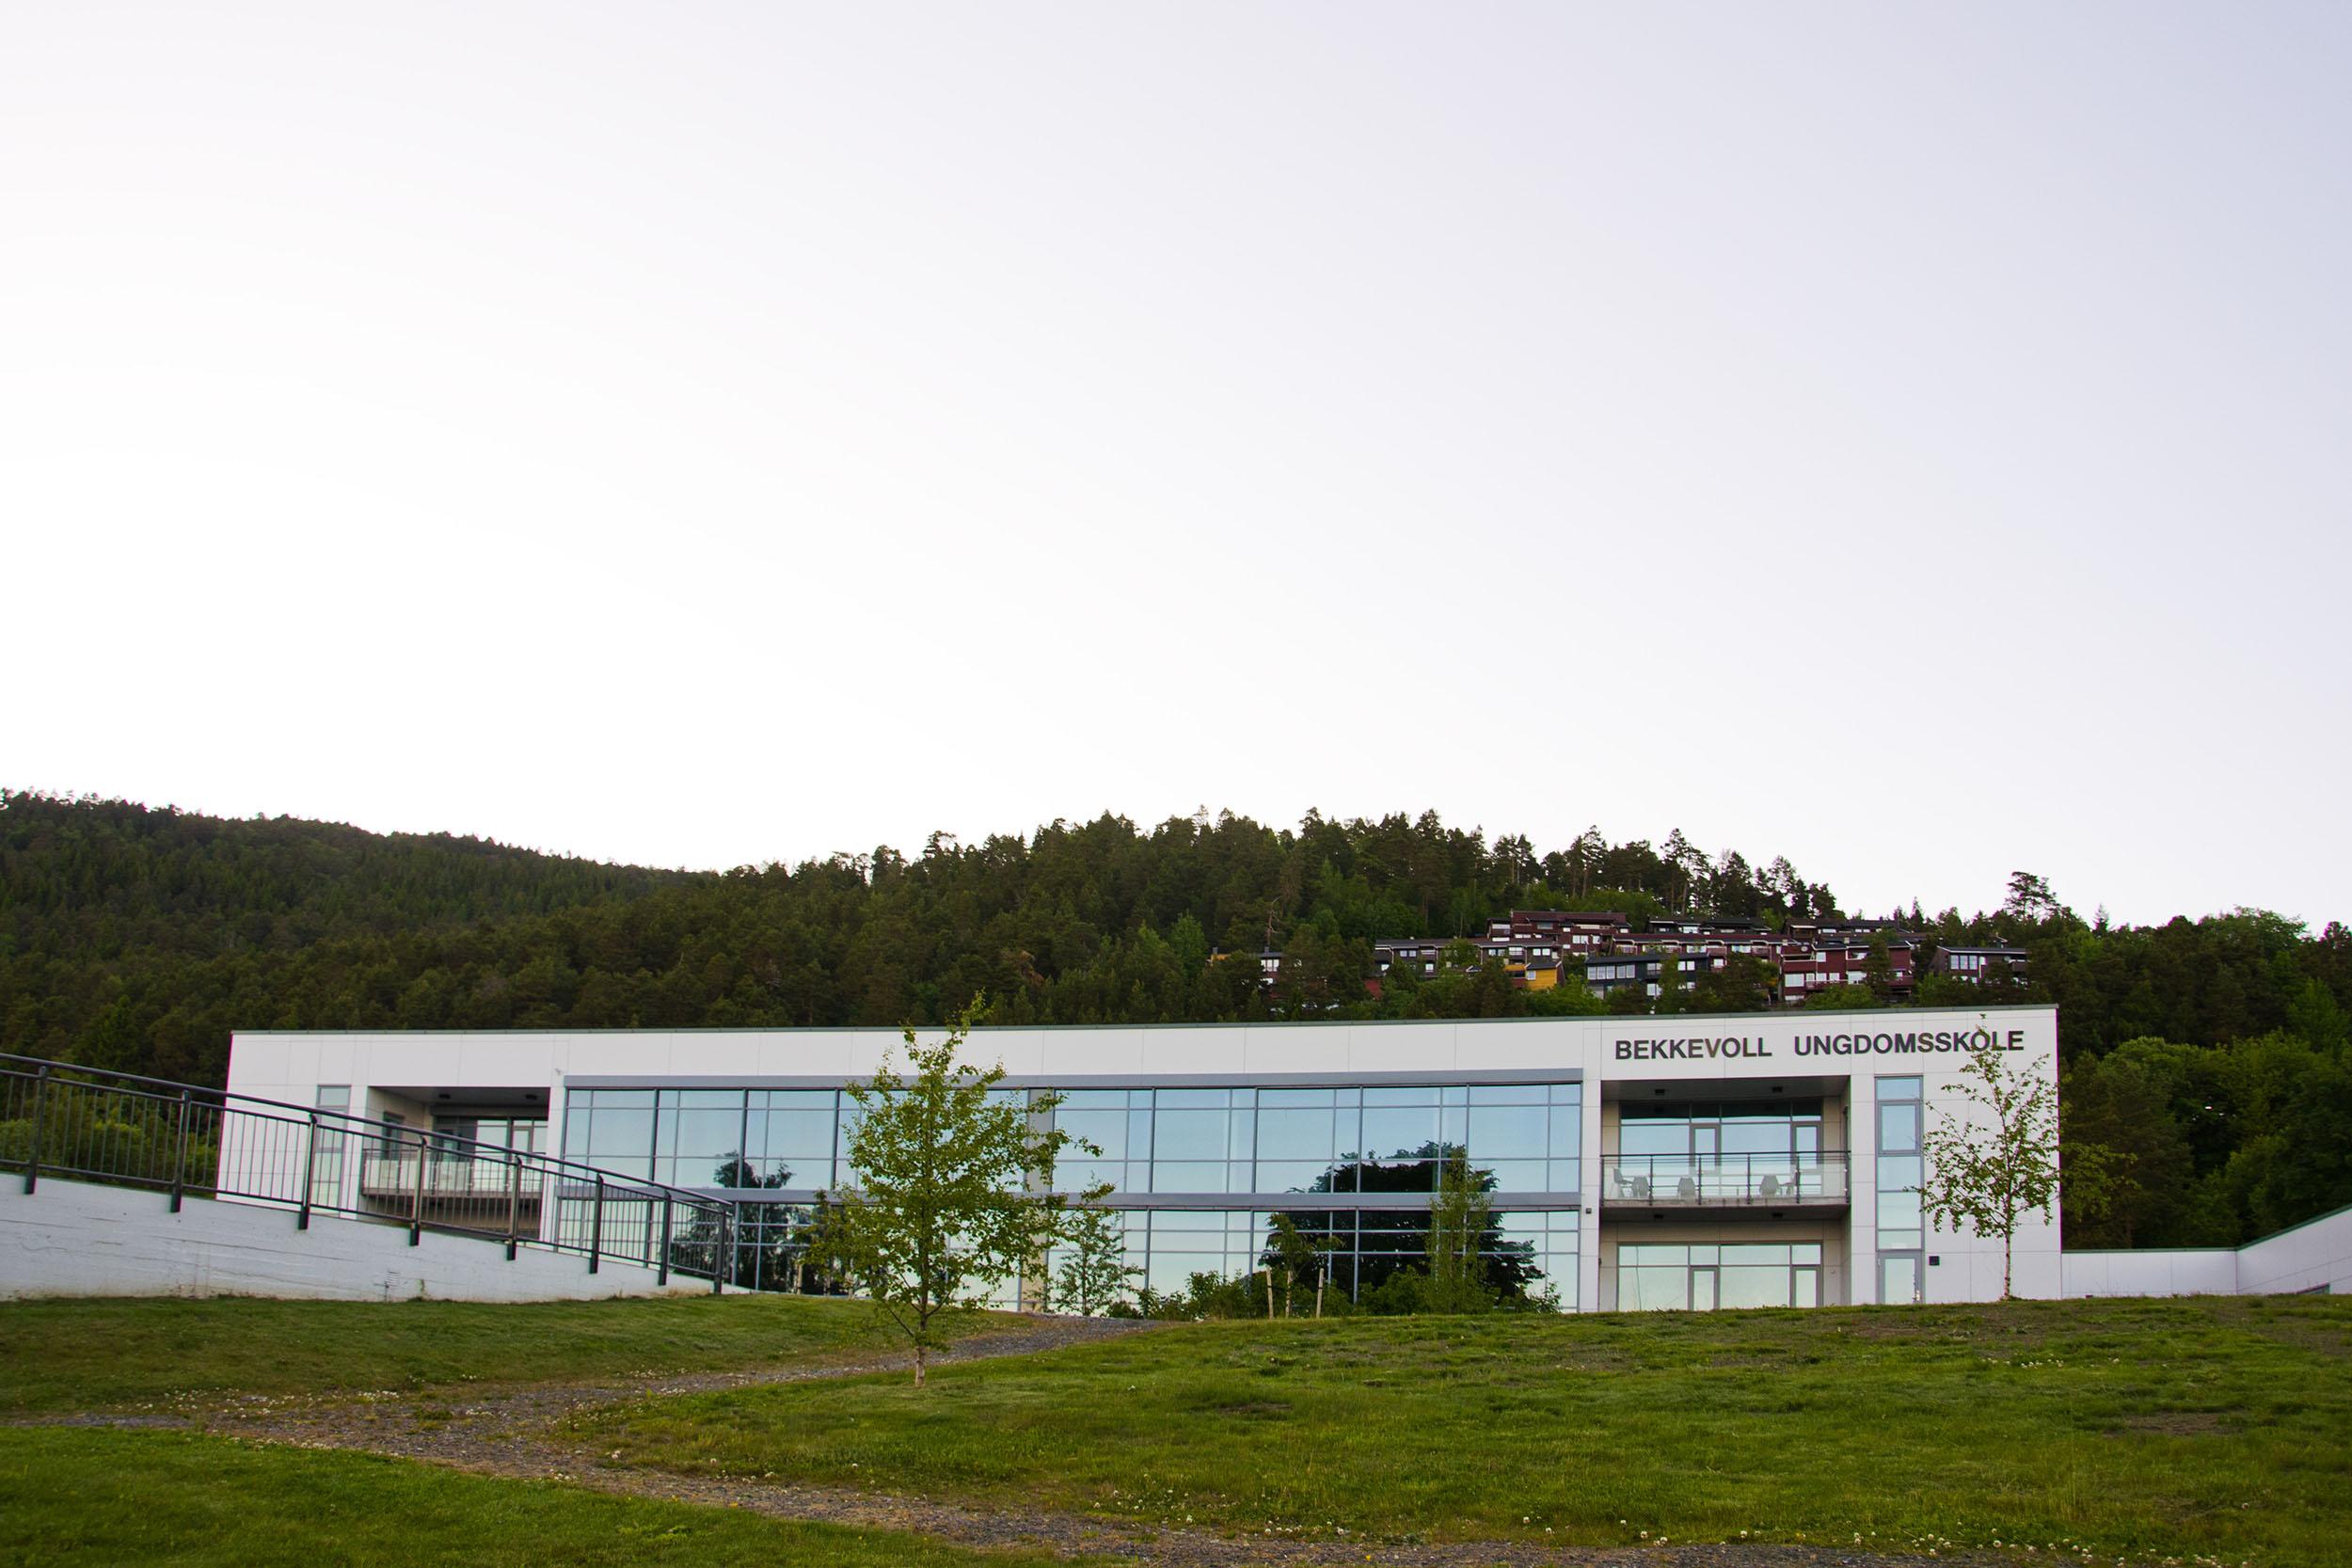 Bekkevoll_Ungdomsskole2.jpg